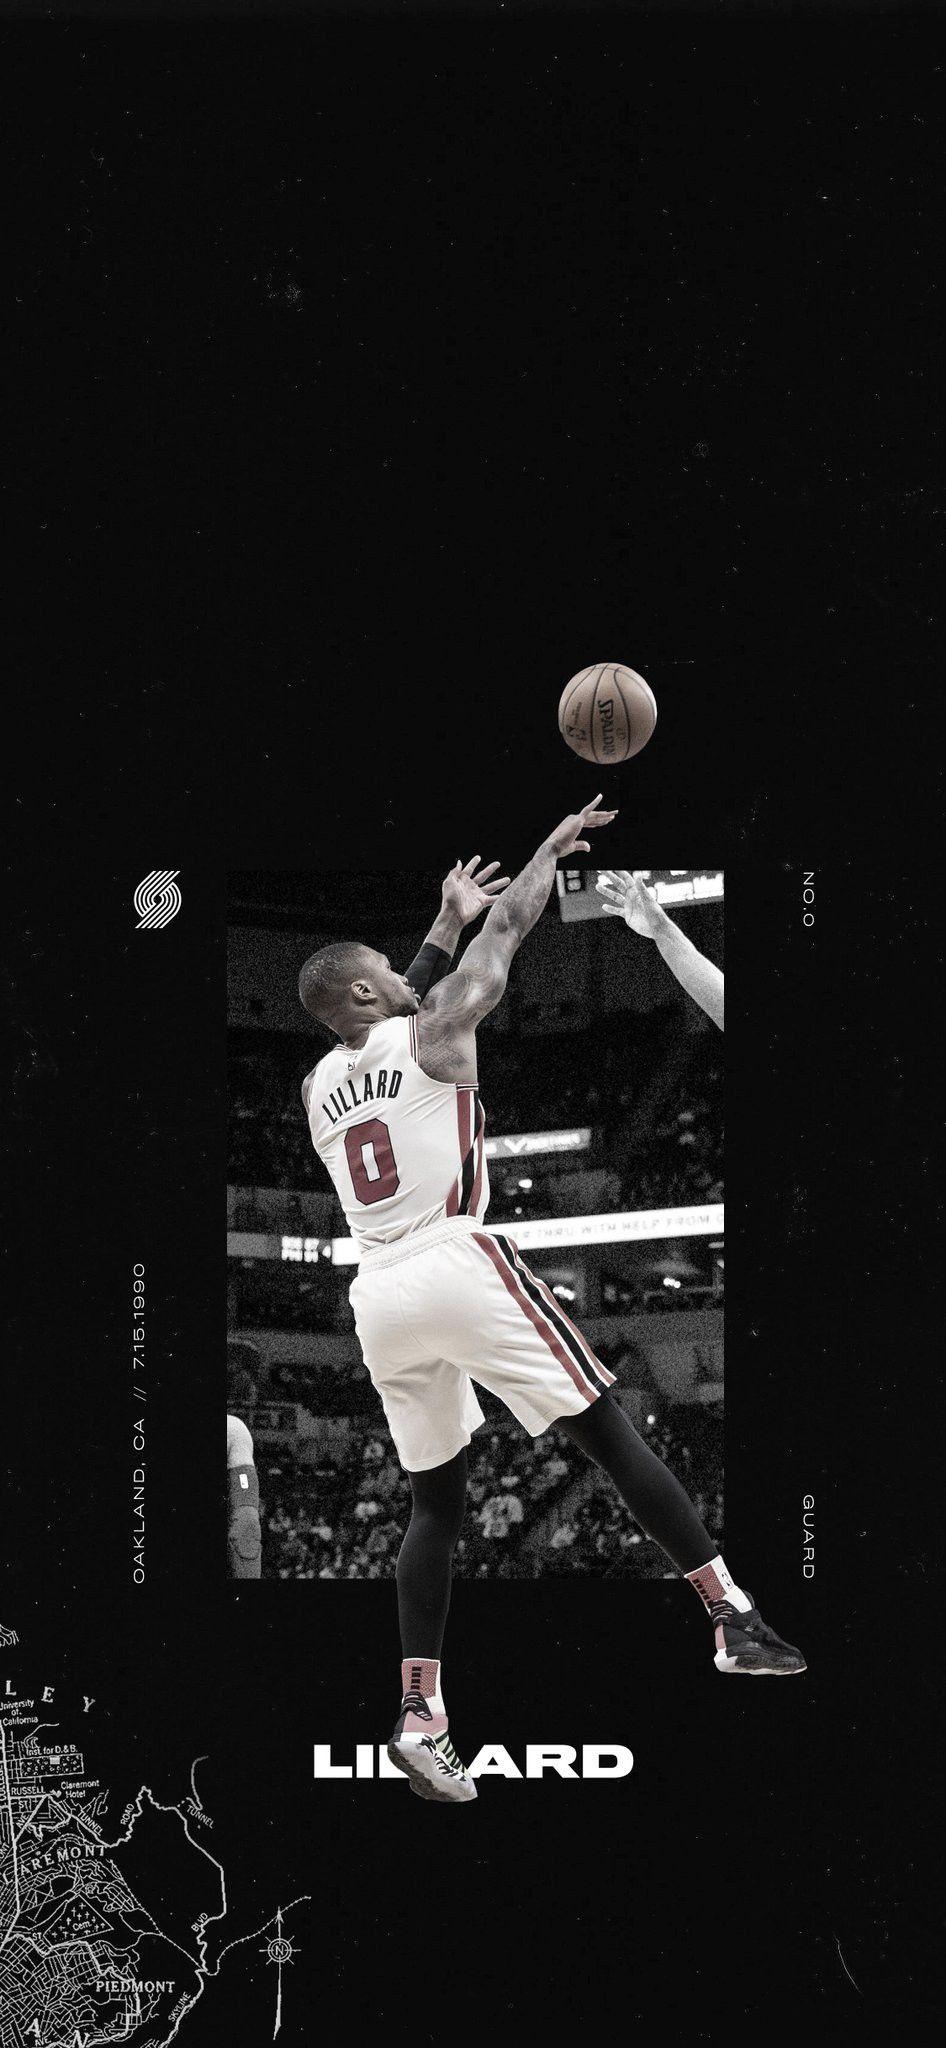 Damian Lillard Wallpaper In 2020 Nba Wallpapers Damian Lillard Basketball Design